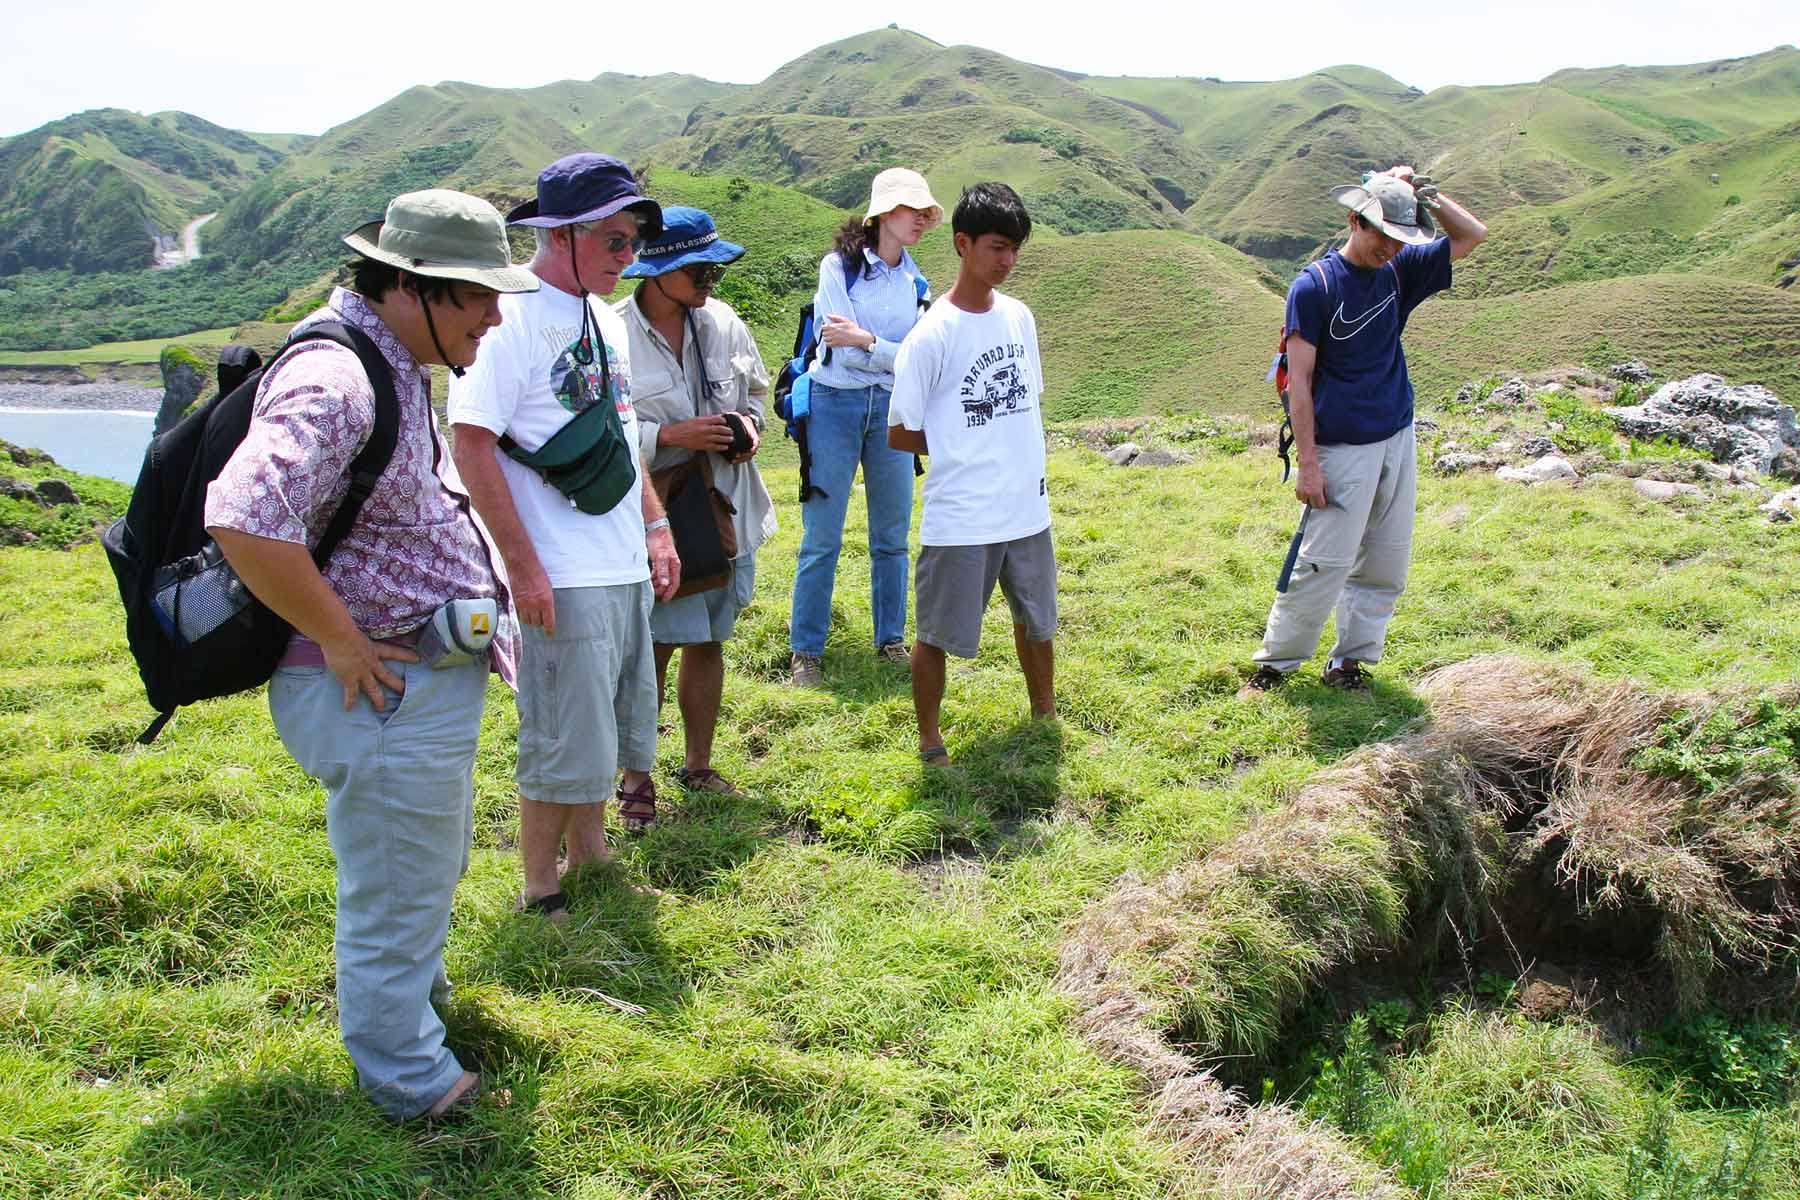 Batanes Islands Photo Journal - Peter Bellwood - Austronesian Archaeology - Exploratory Research - Dr Steven Andrew Martin